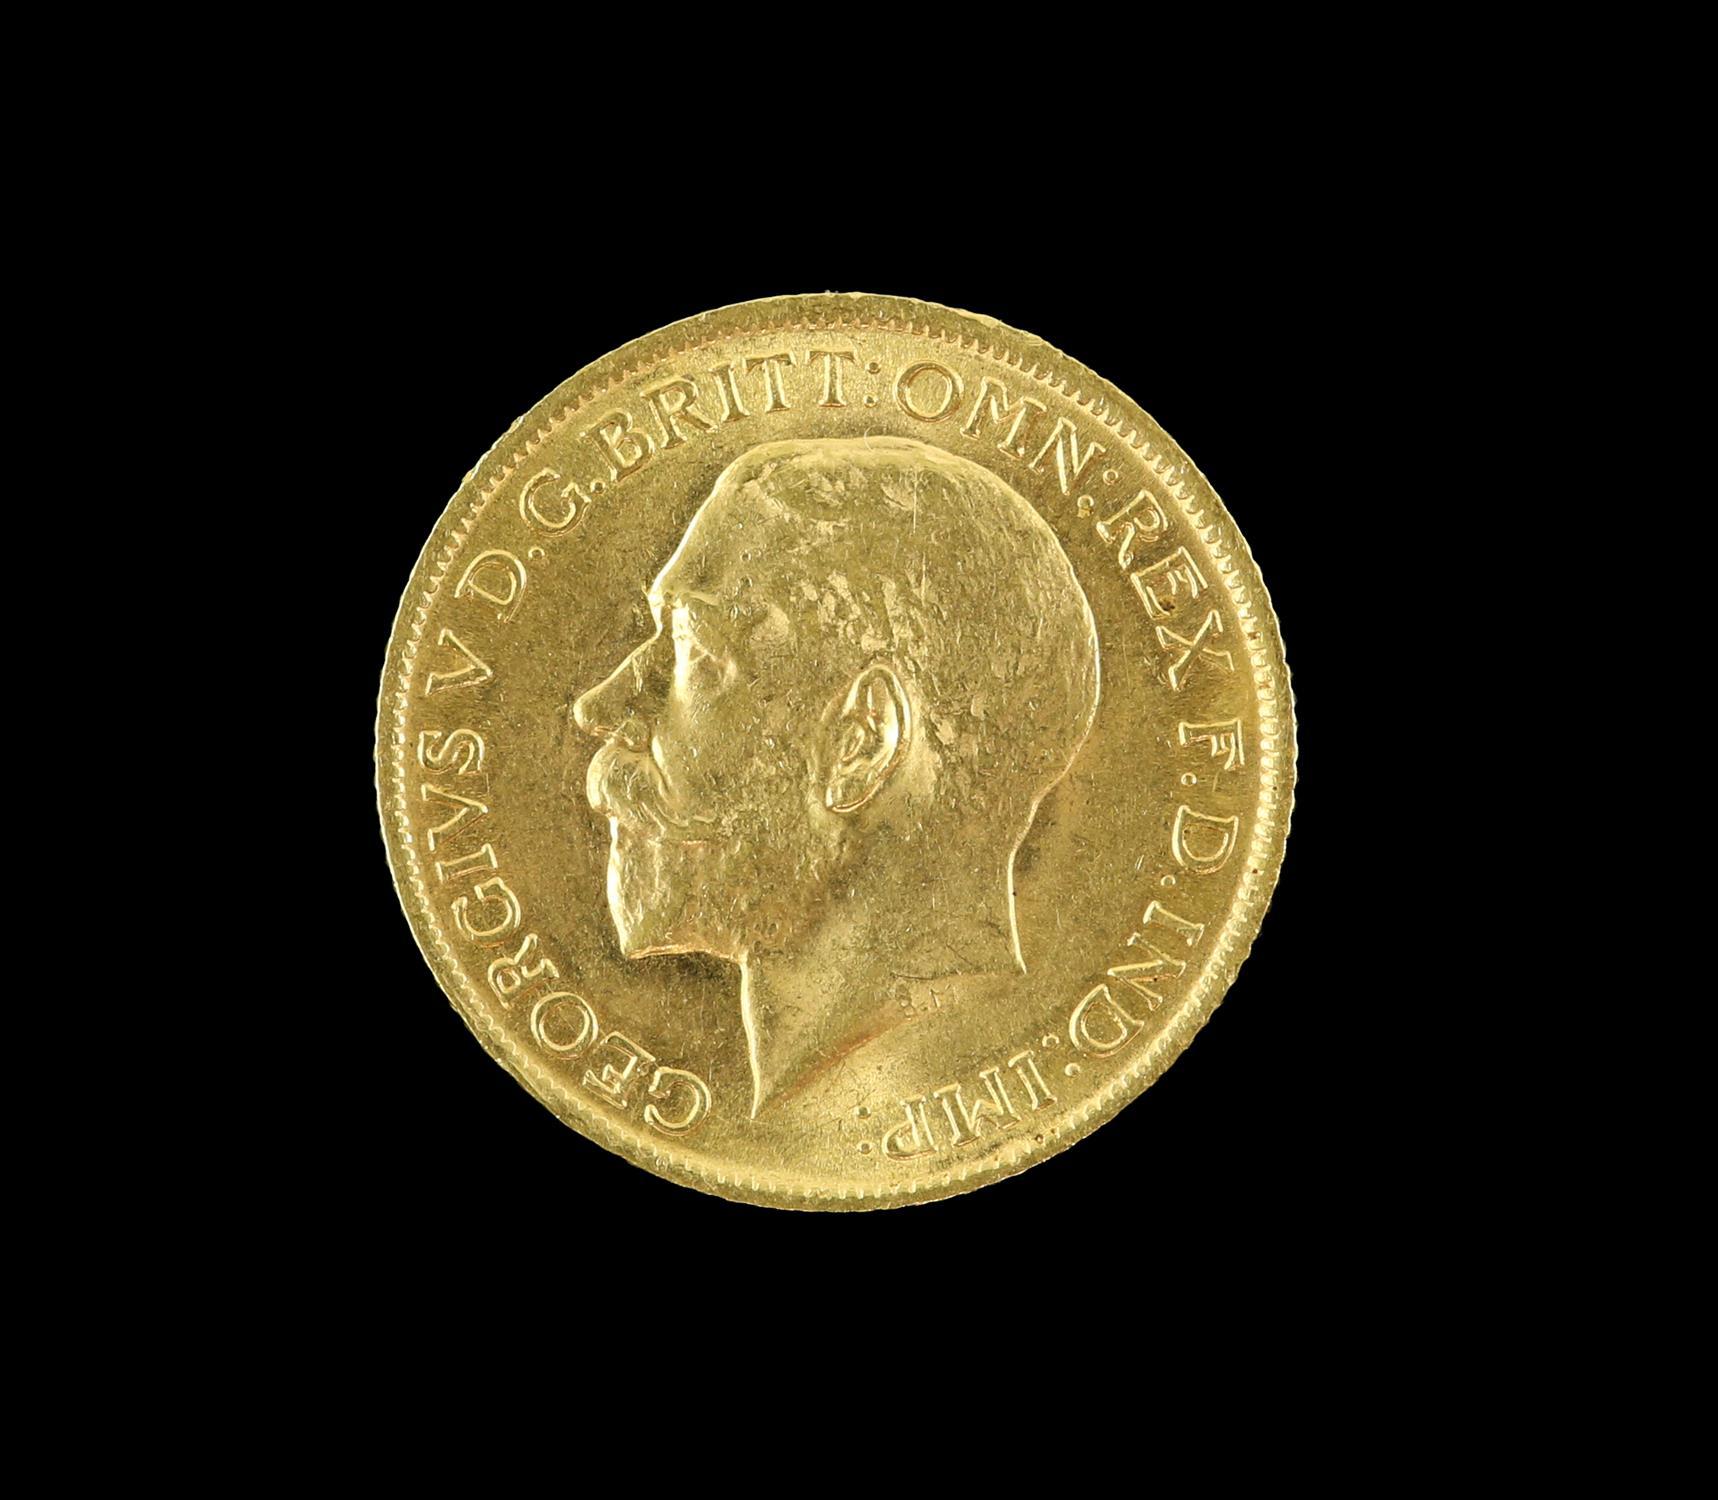 George V gold sovereign 1914 - Image 2 of 2